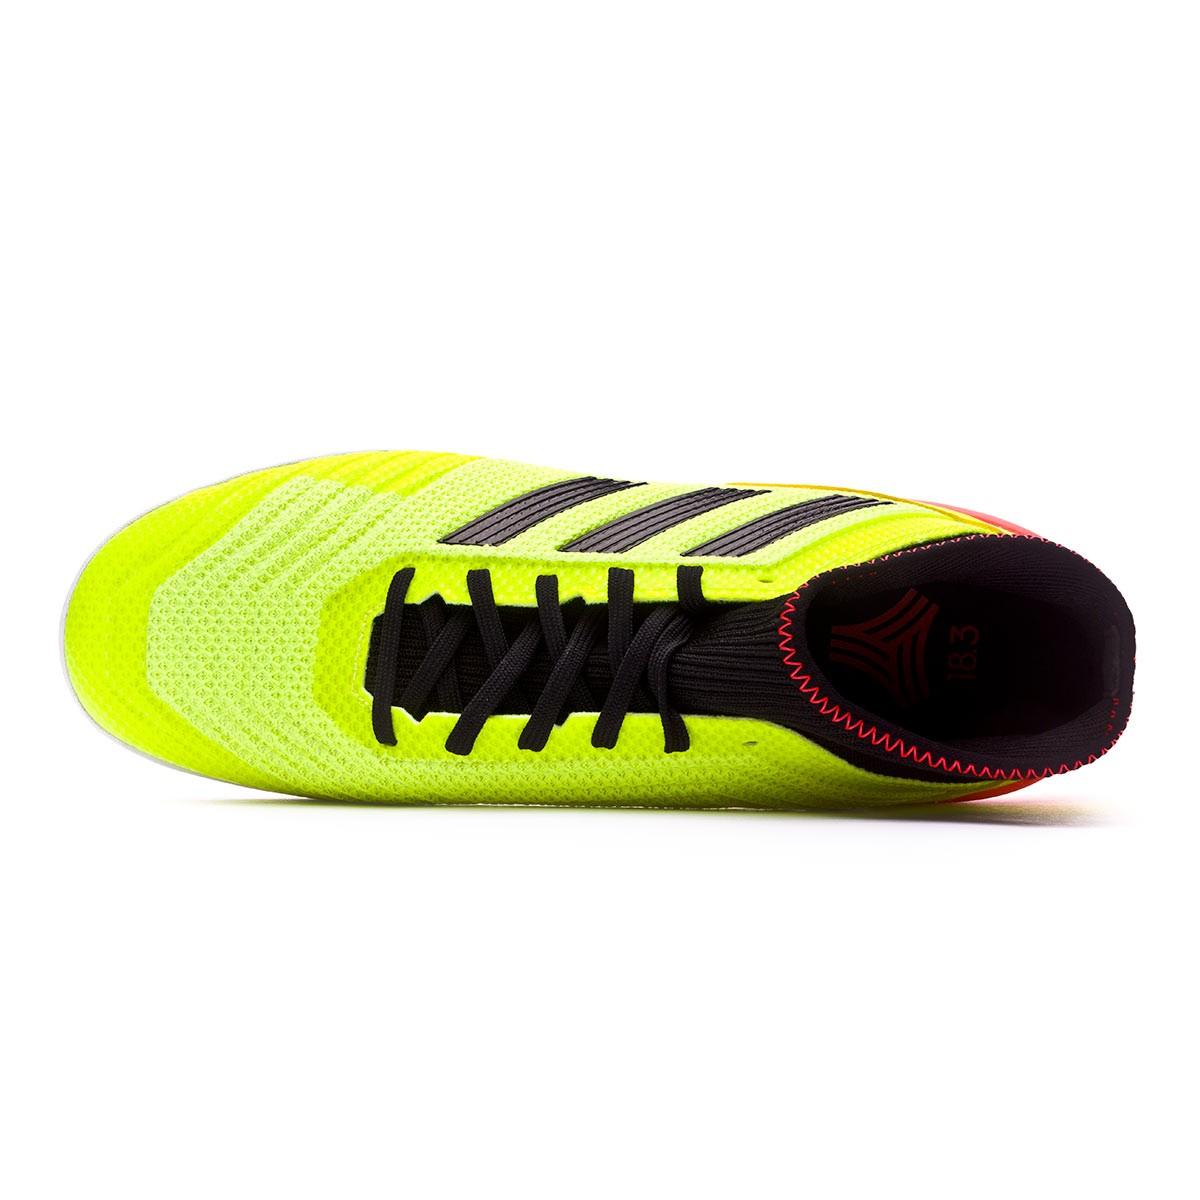 ... Zapatilla Predator Tango 18.3 IN Solar yellow-Black-Solar red. CATEGORY d207295db28a0